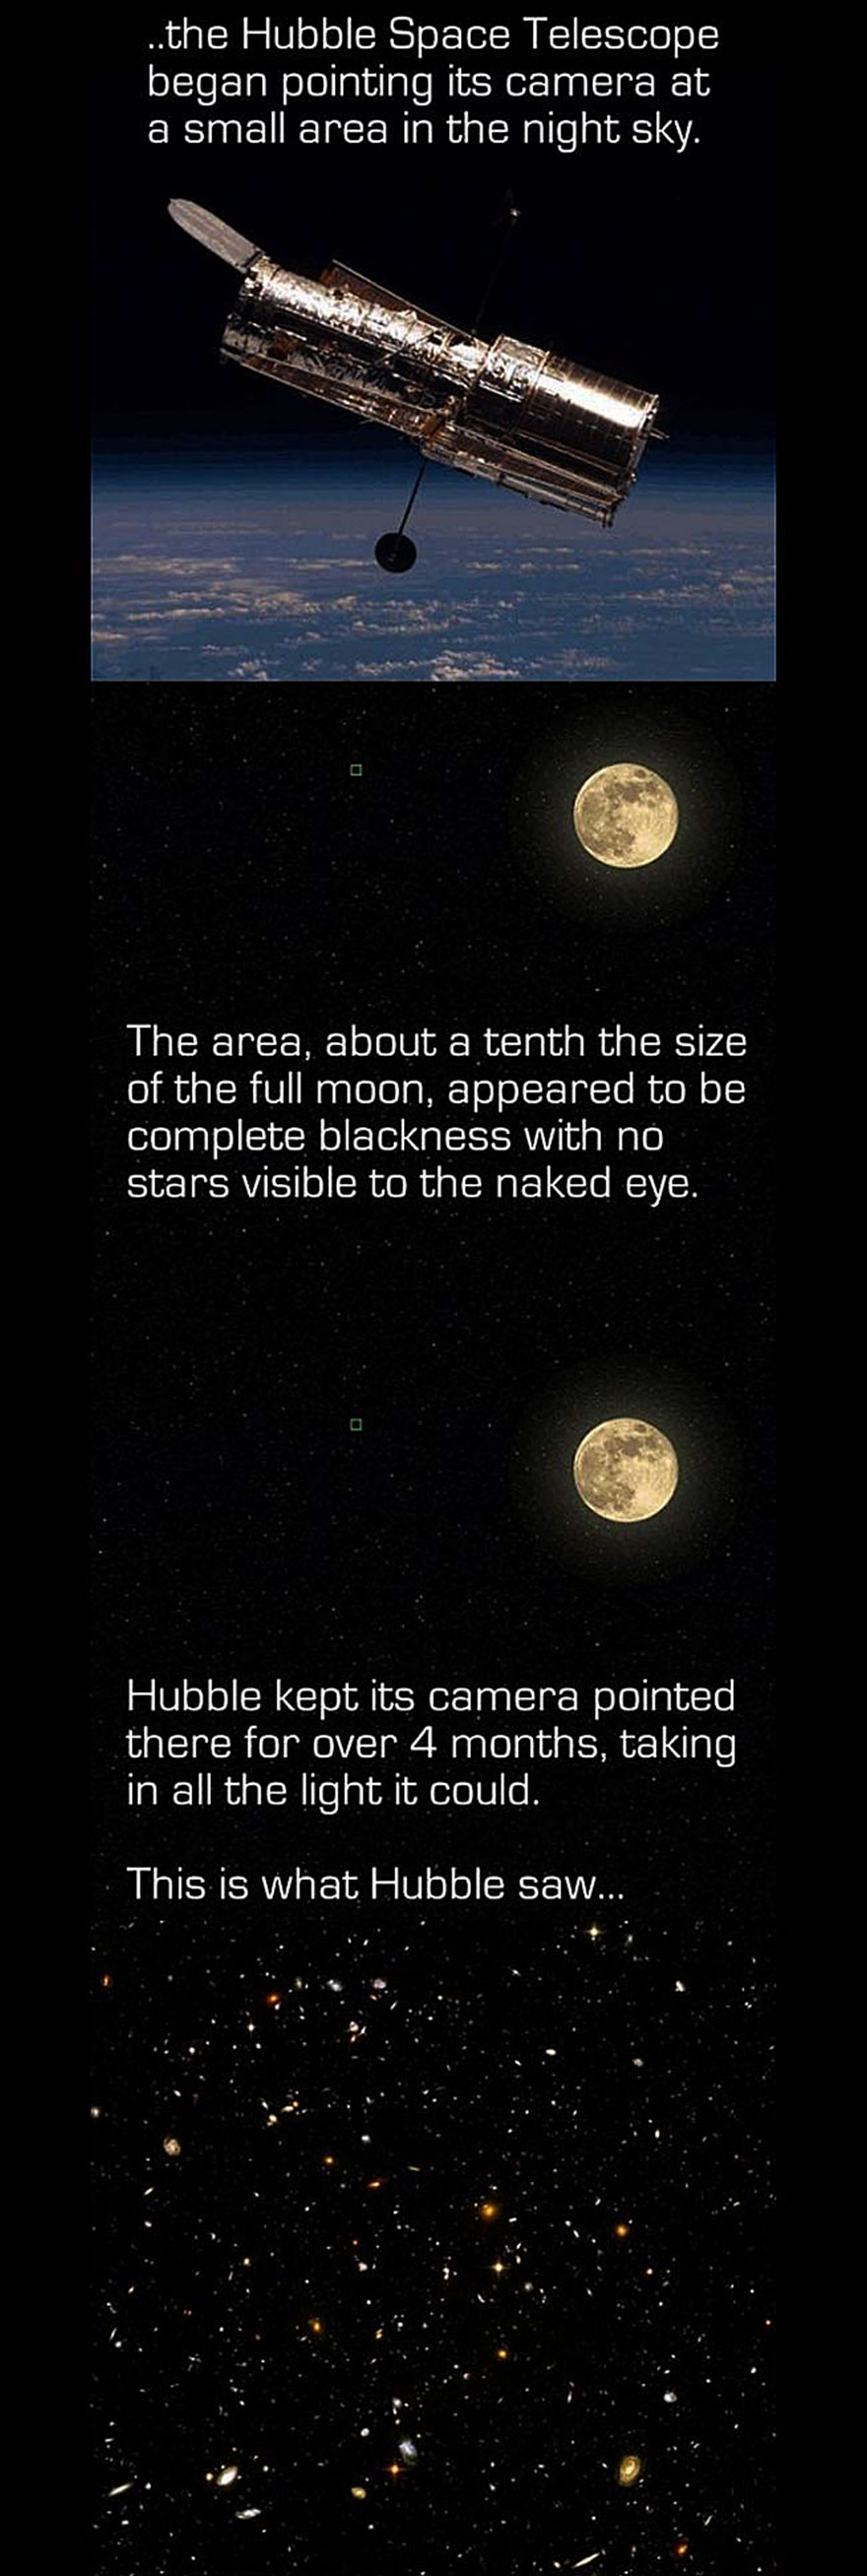 Space-Telescope-camera-sky-earth-moon